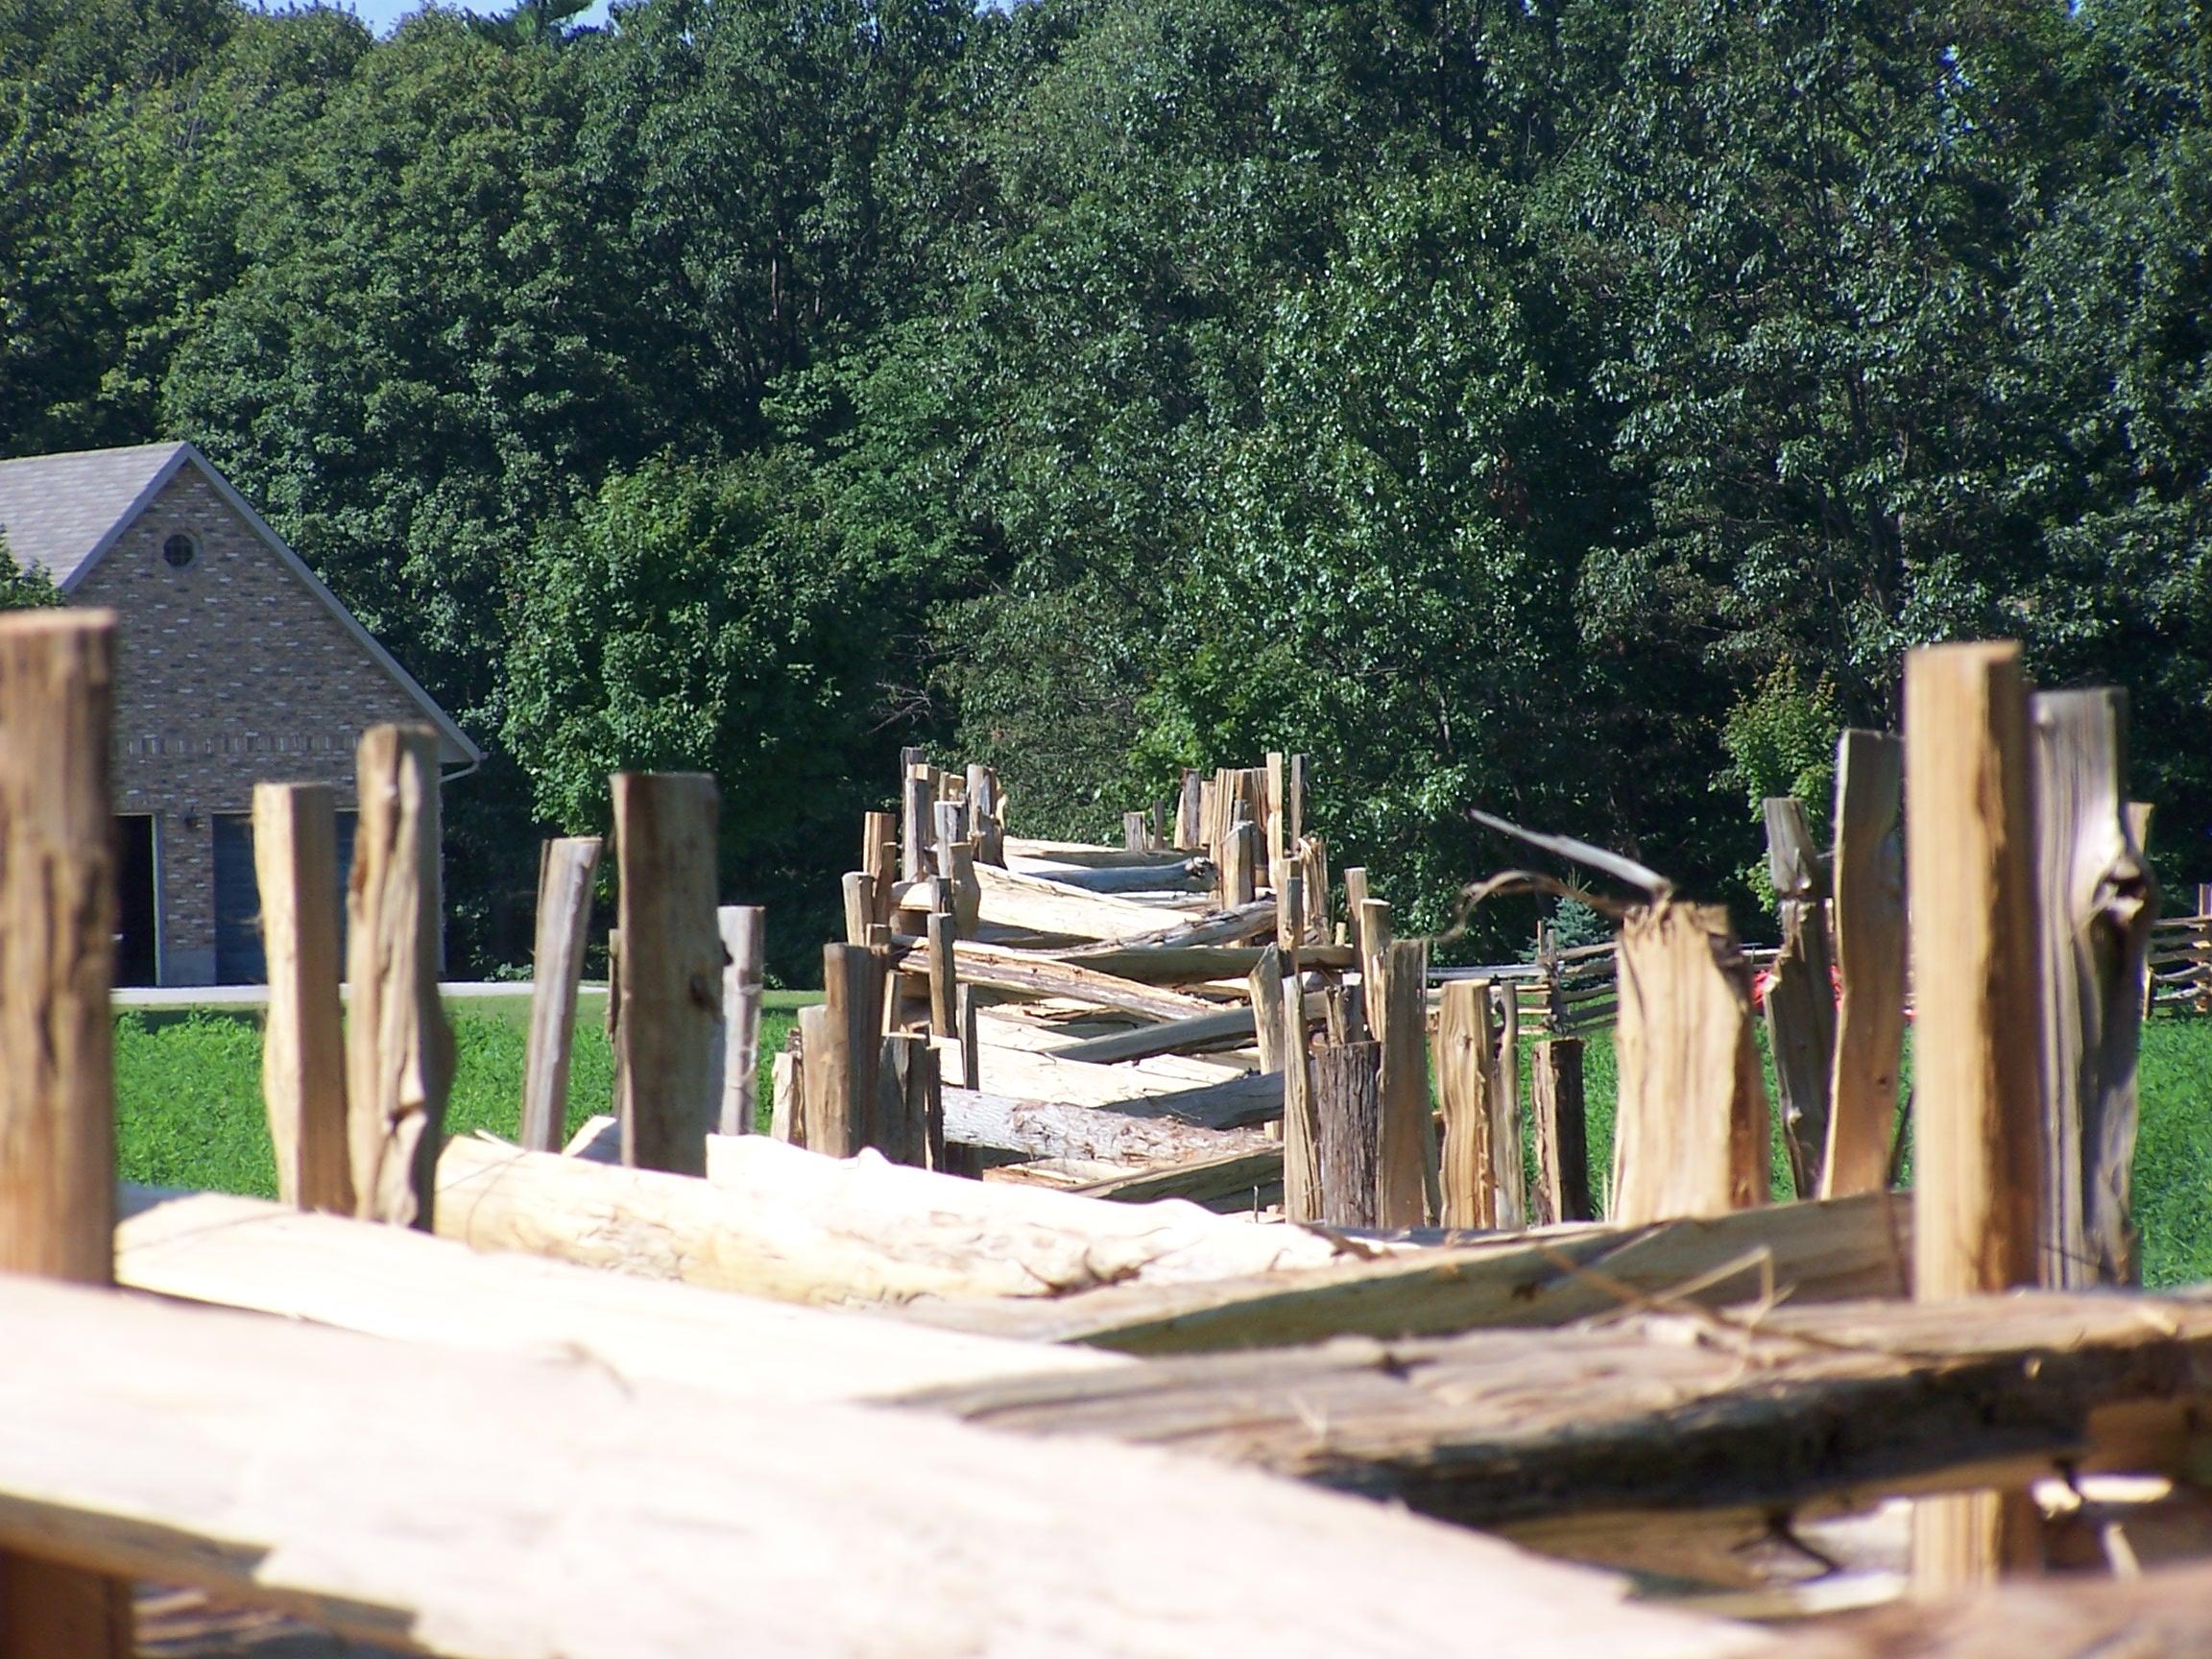 snake rail fence - top - zig zag